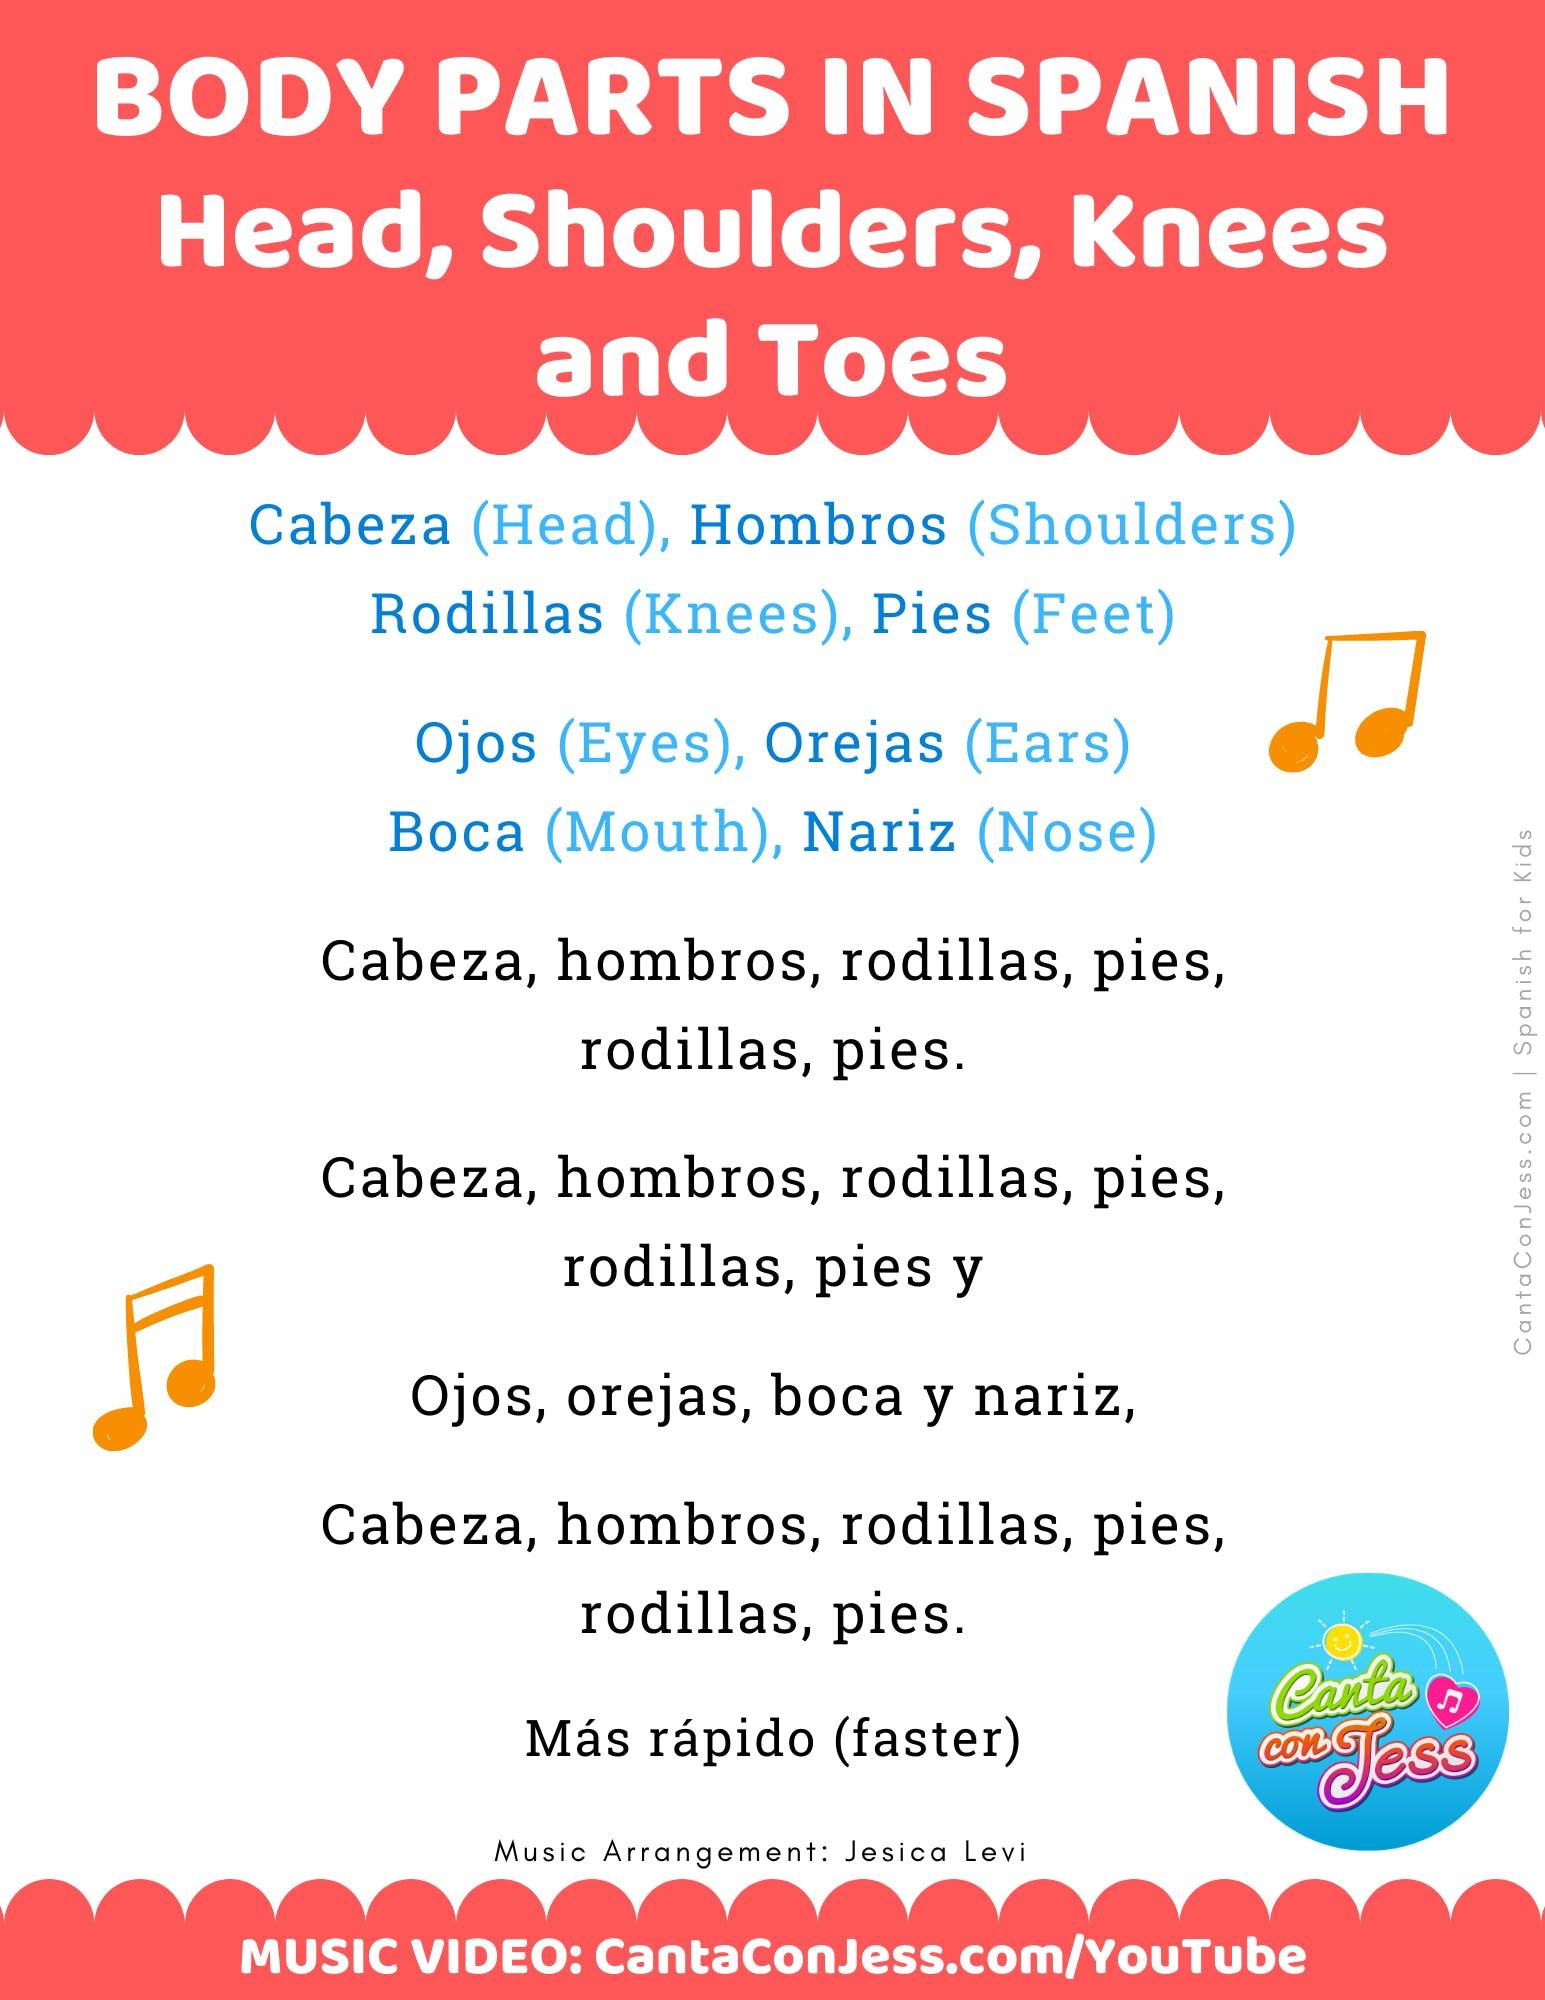 Head, Shoulders, Knees and Toes in Spanish LYRICS